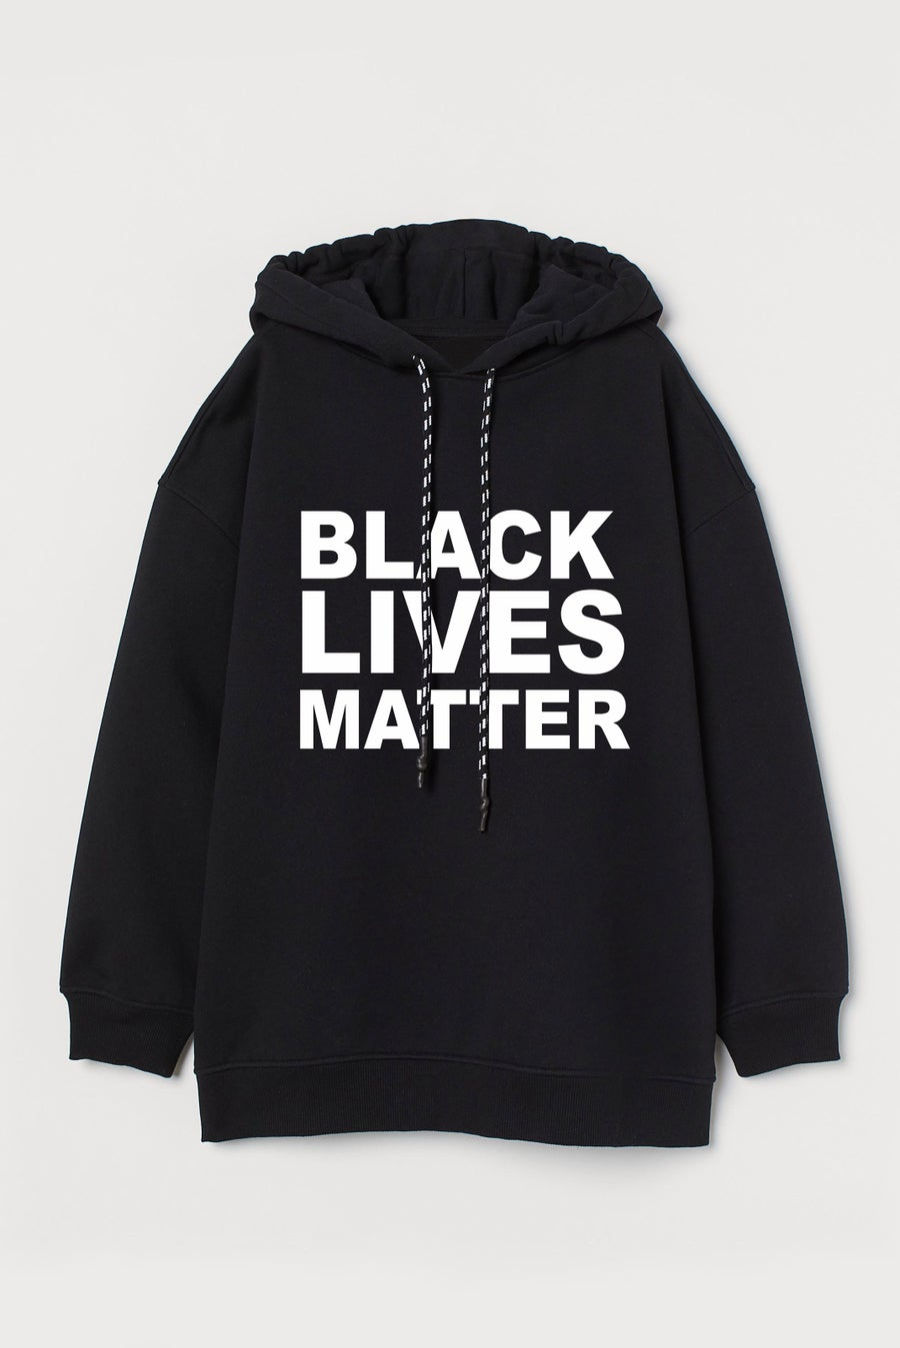 Image of BLACK LIVES MATTER Hoodie